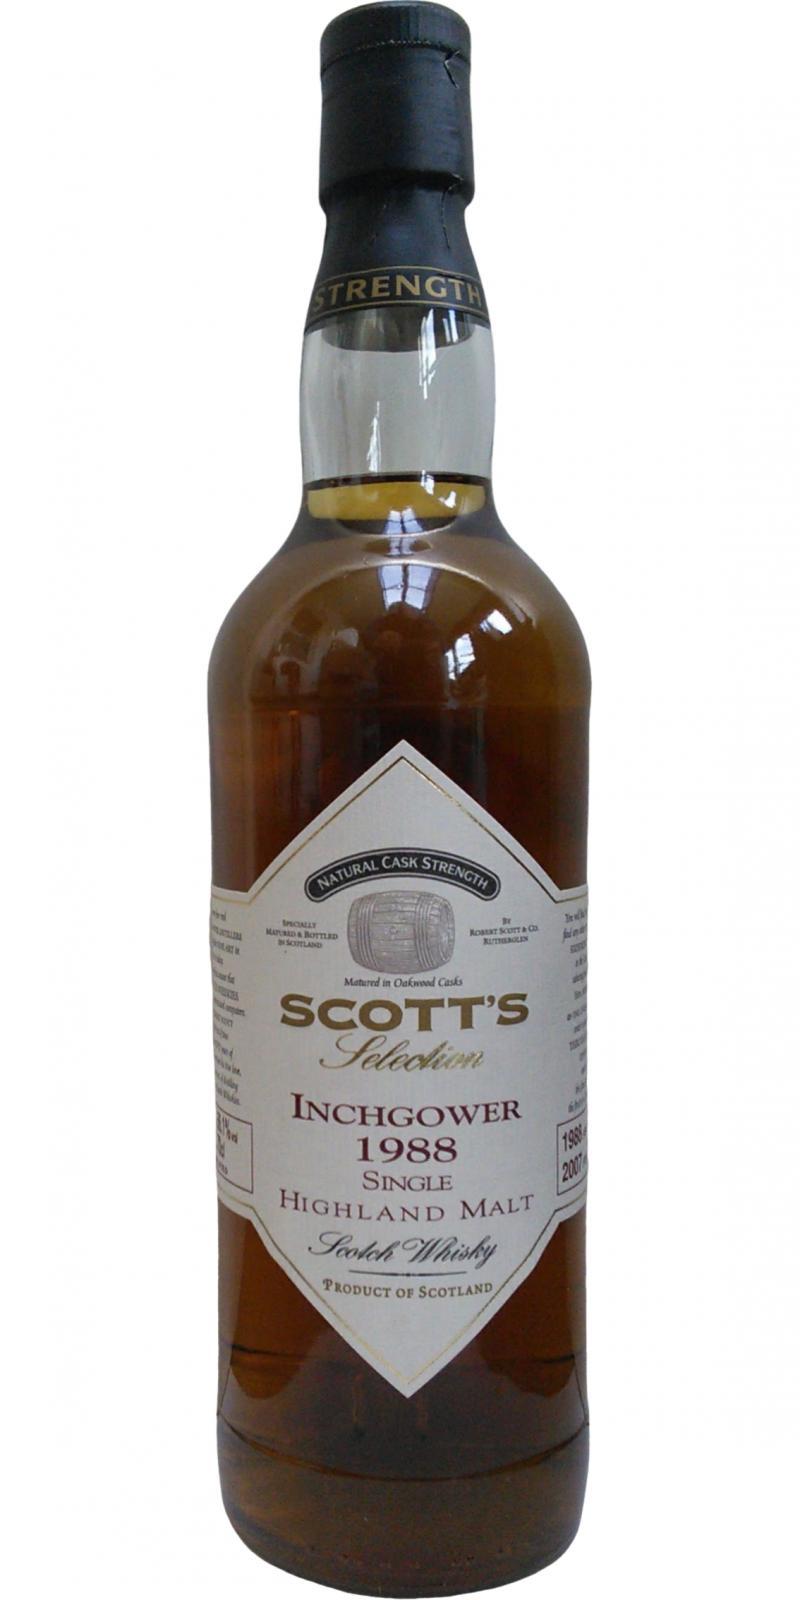 Inchgower 1988 Sc